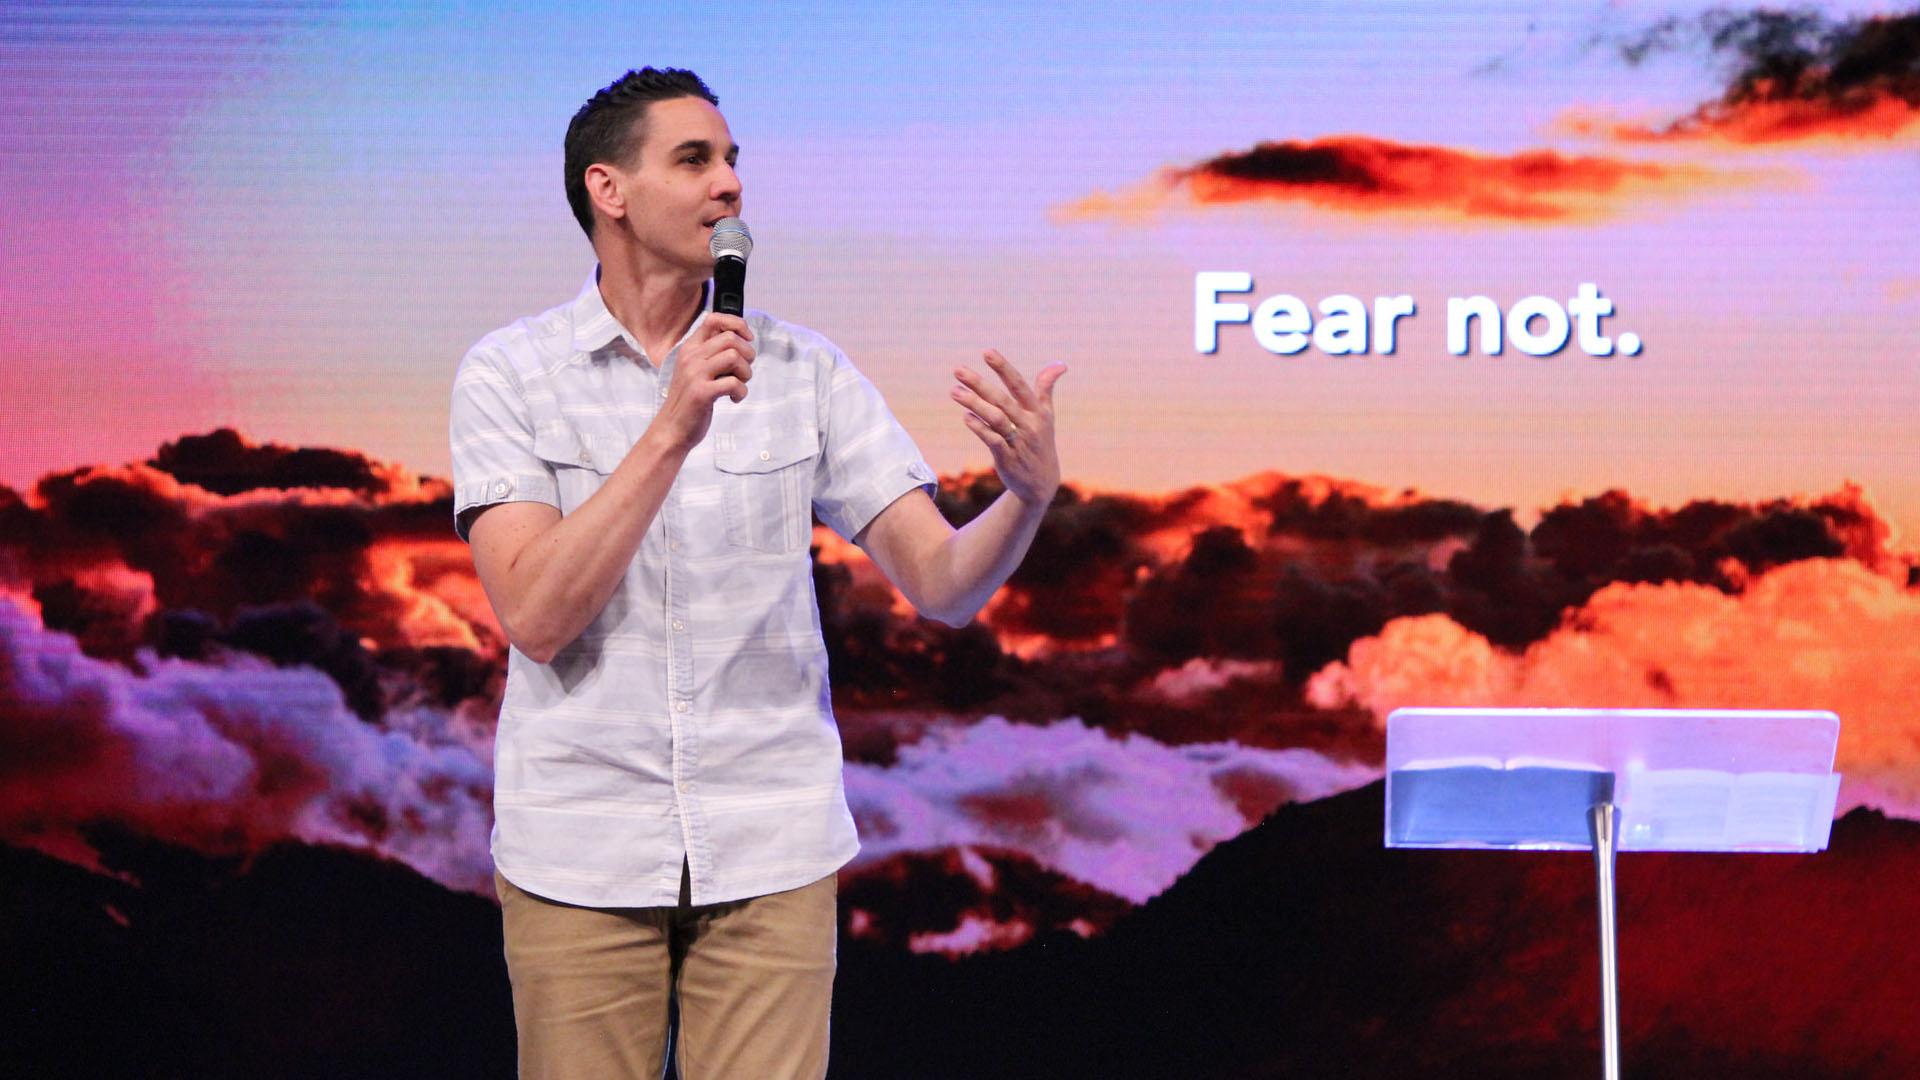 Watch When Facing Fear